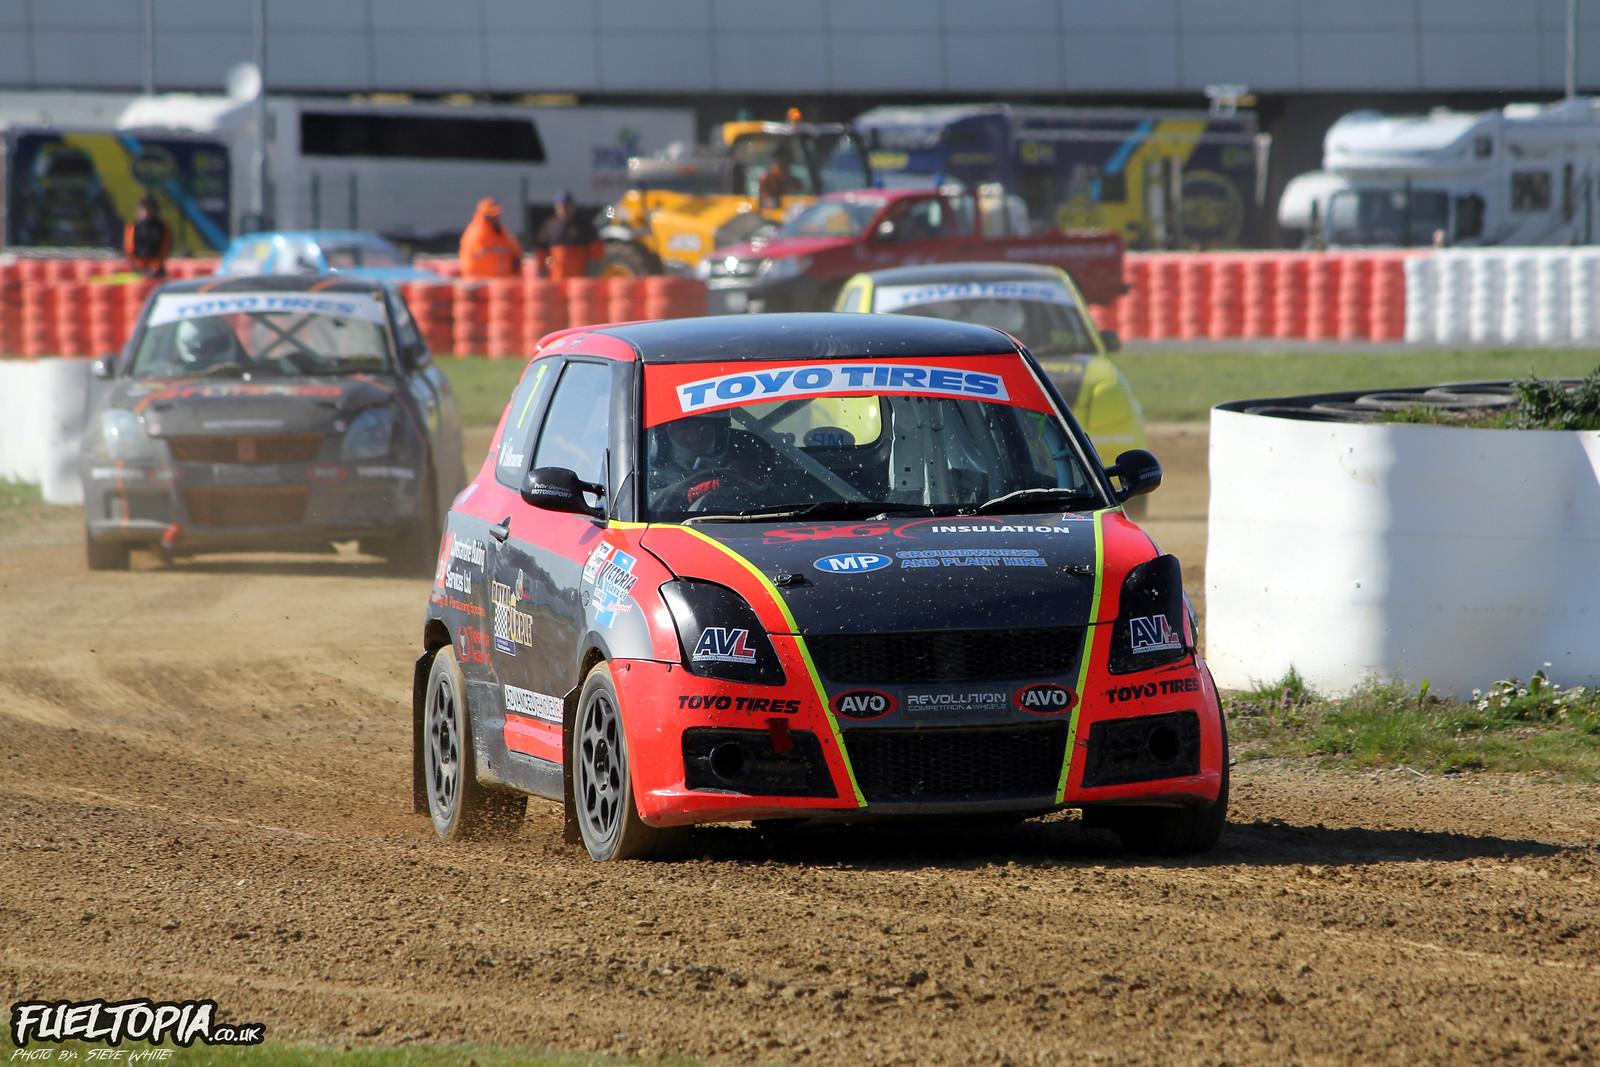 Tom Constantine Suzuki Swift BRX British Rallycross Championship 2019 Steve White Fueltopia